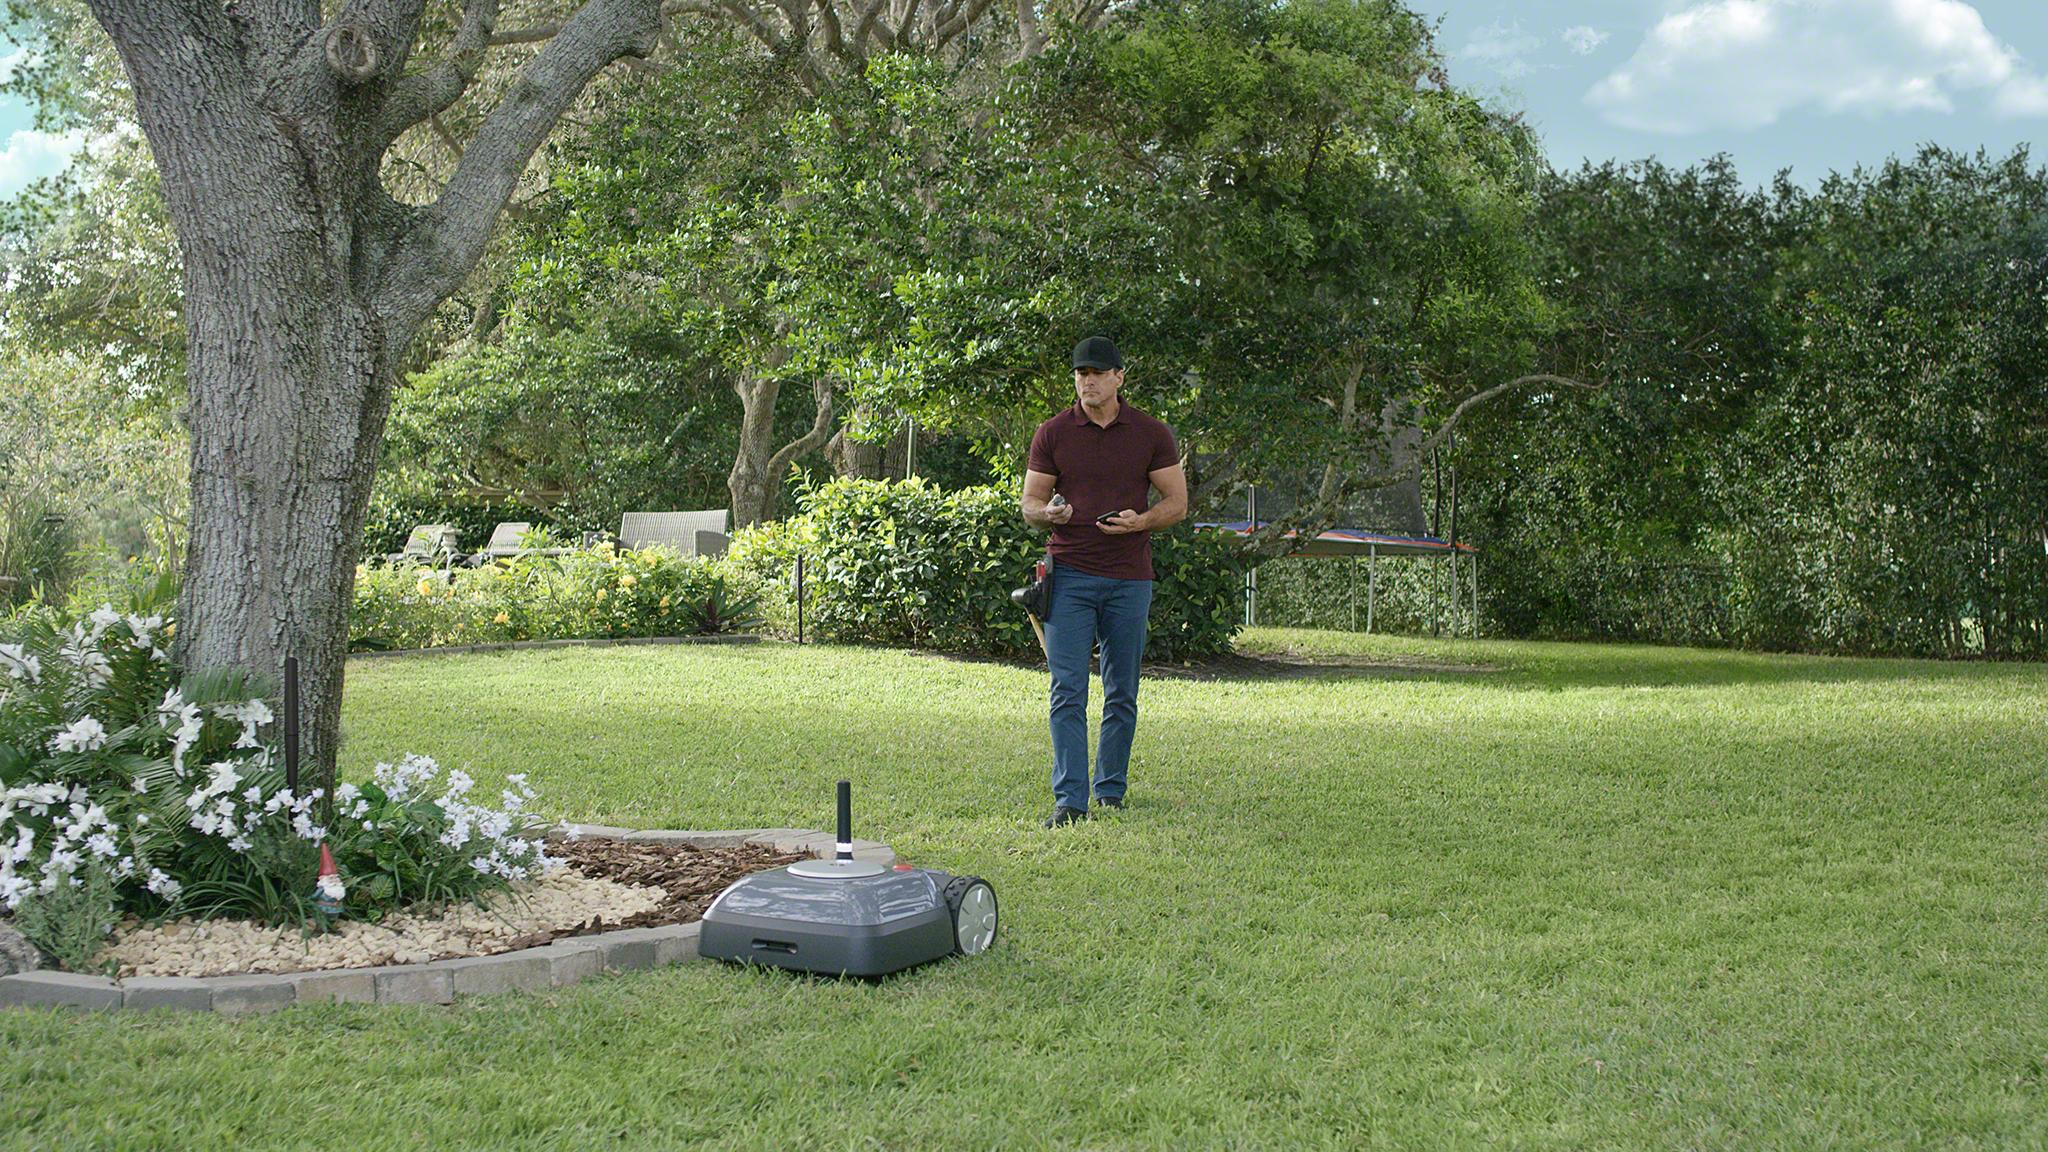 irobot enters the robotic mower market with terra